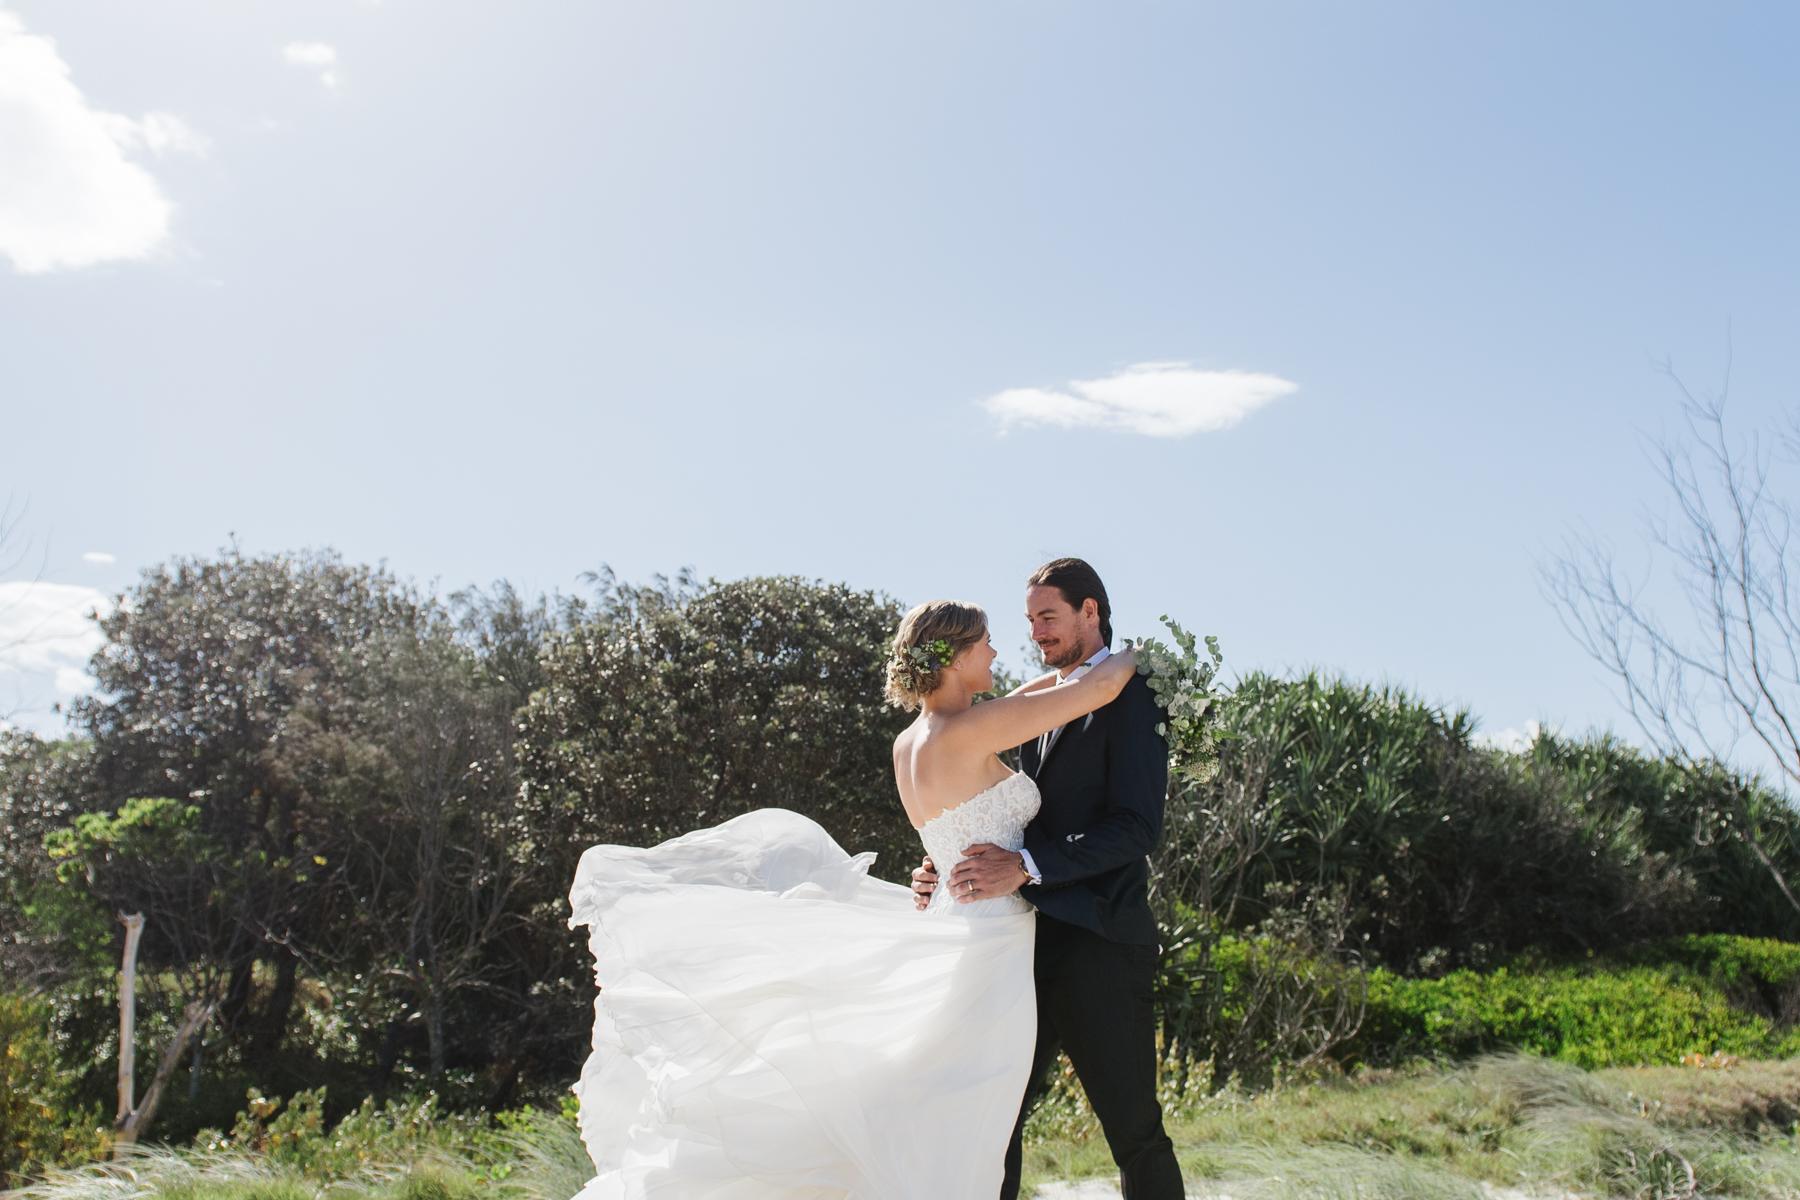 Cass and Josh- wedding photographer, byron bay wedding and family photographer, tweed heads wedding and family photography-413.jpg